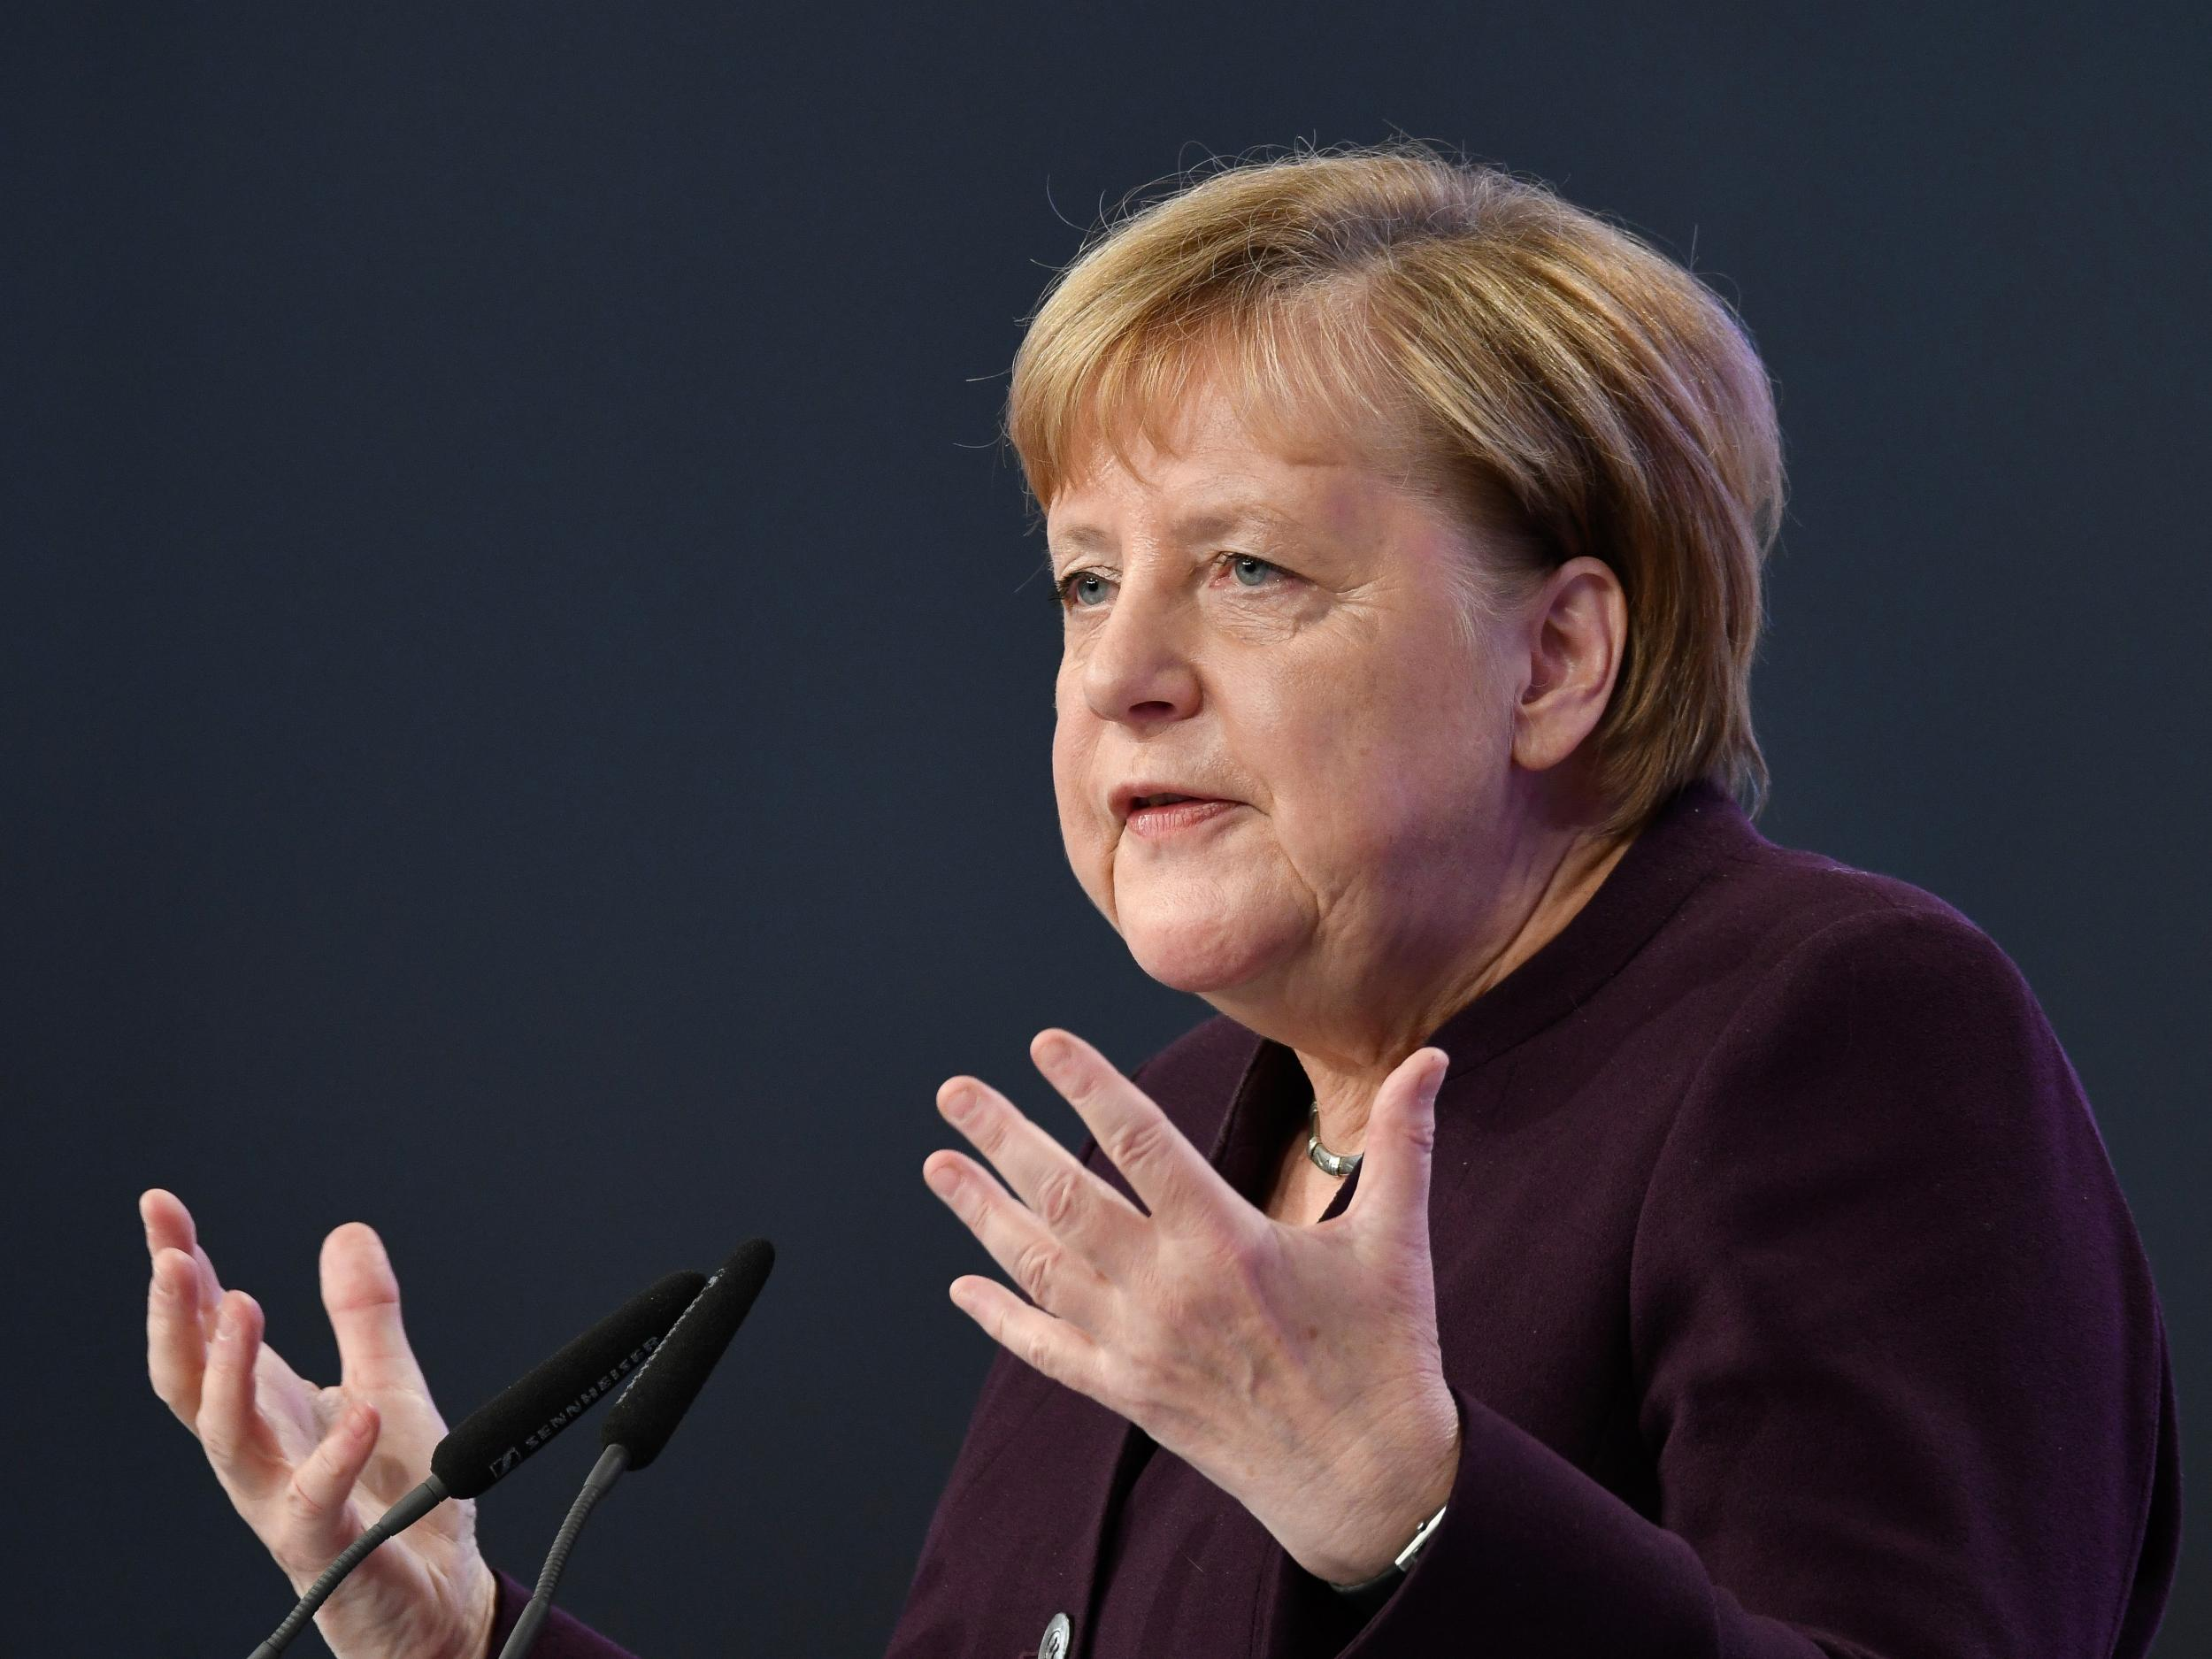 Angela Merkel Topless angela merkel - latest news, breaking stories and comment